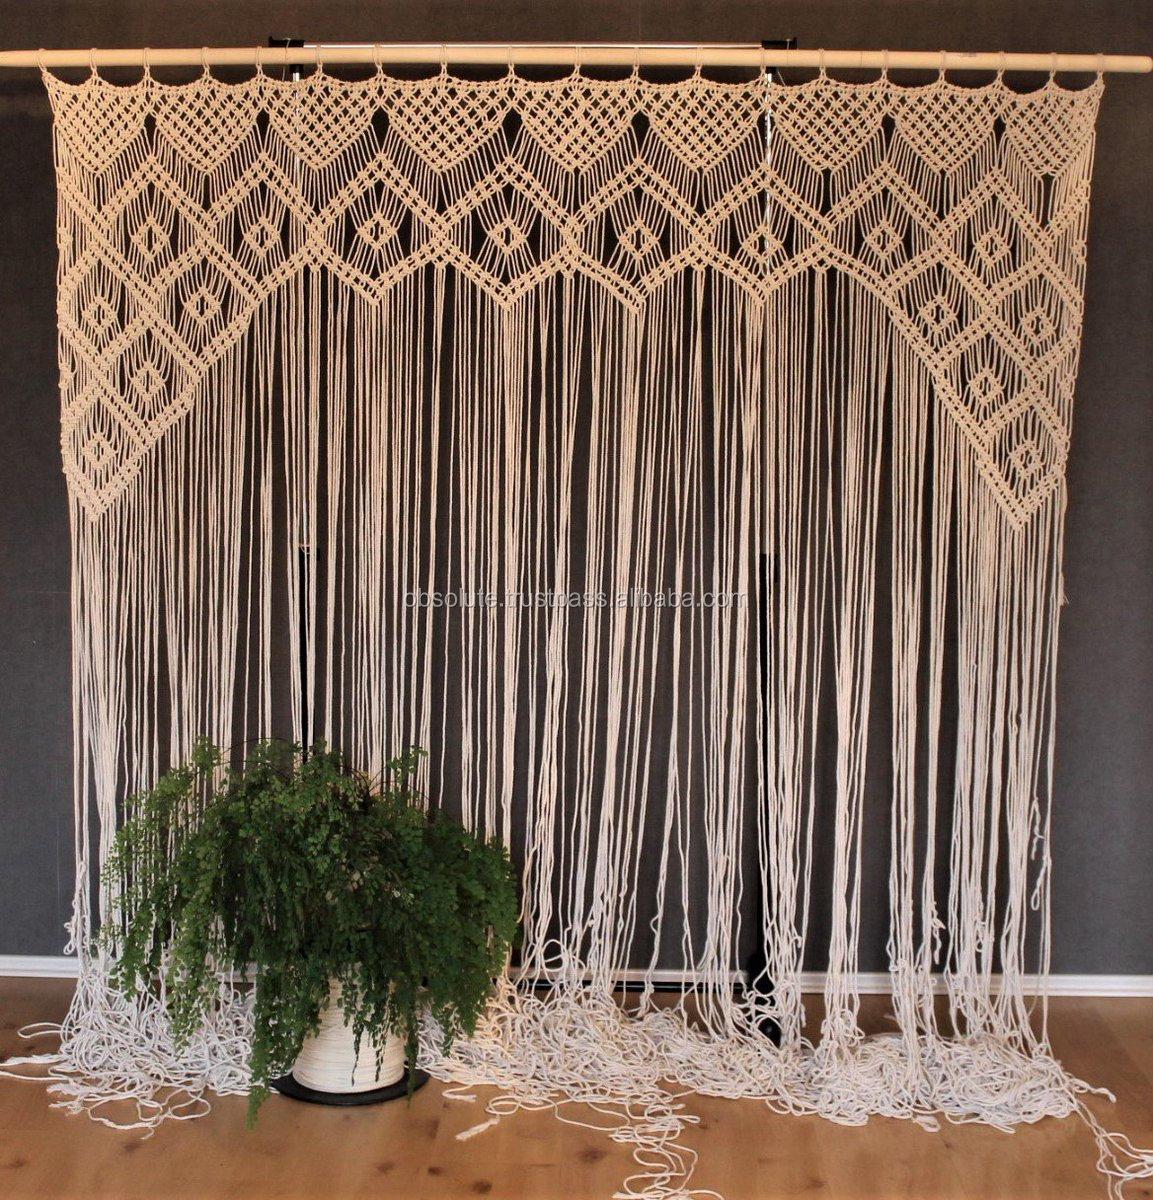 Macrame Handmade Curtain Door Curtain Wedding Backdrop